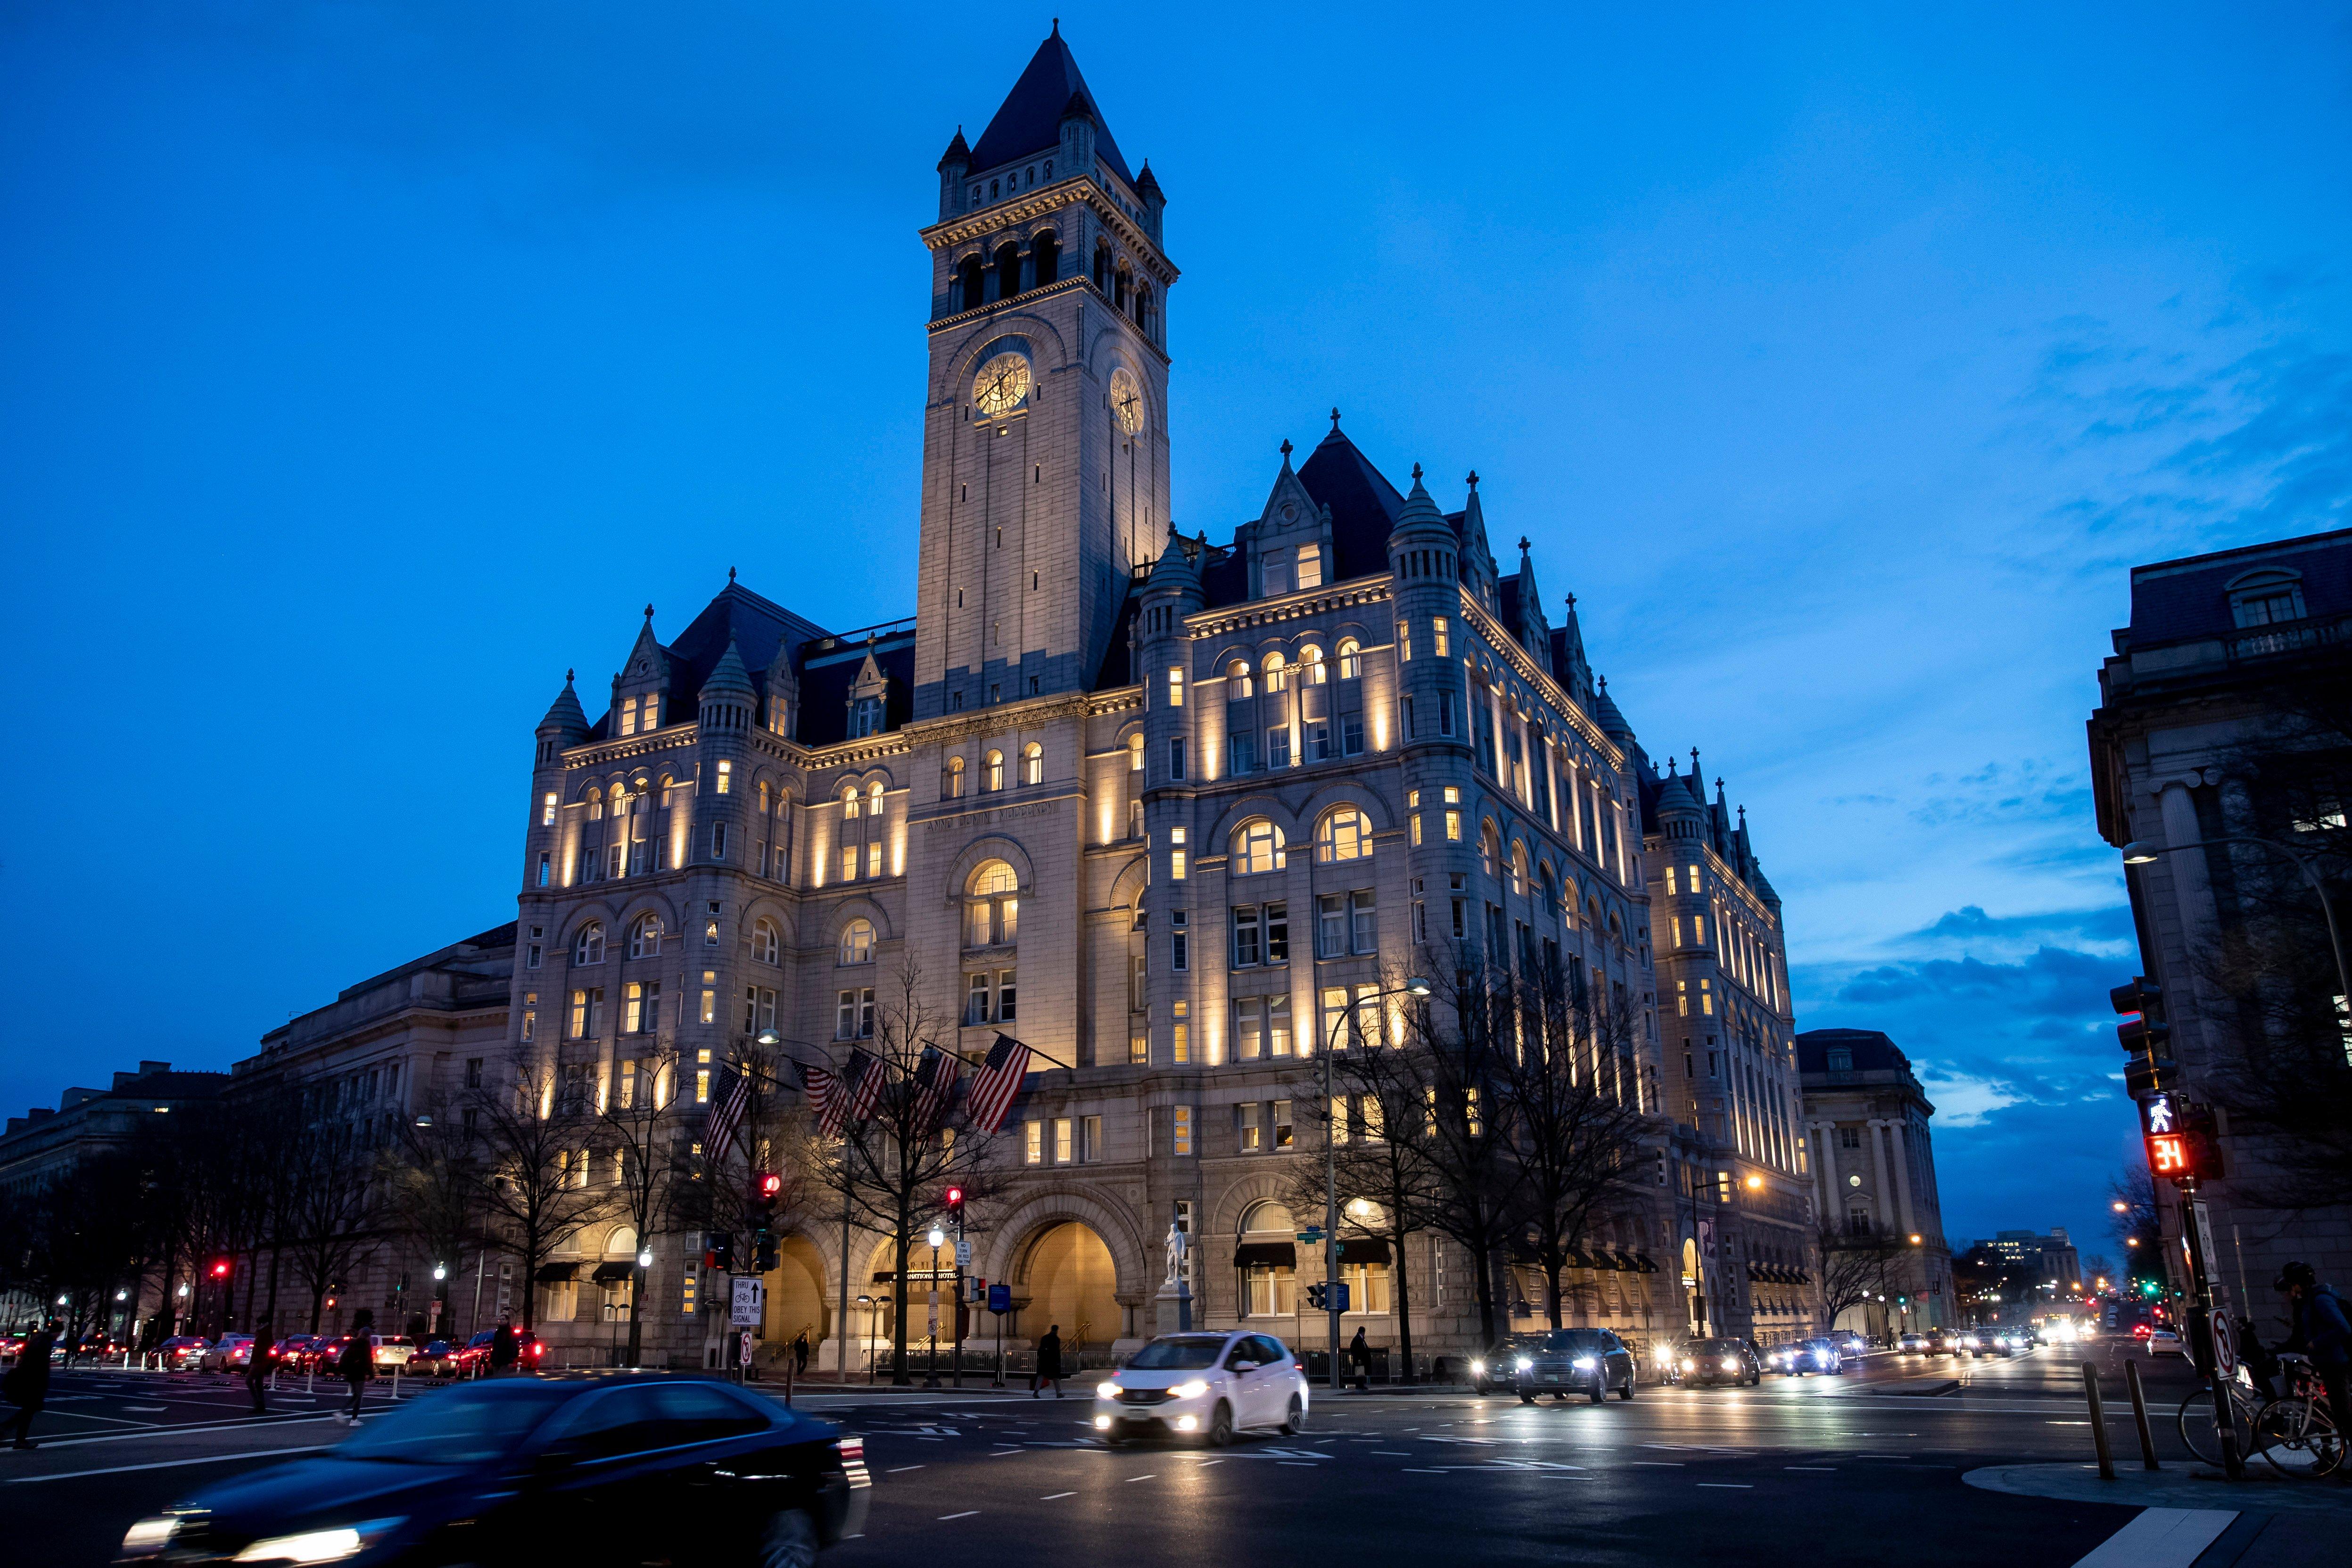 Trump eyes hosting election night party at his Washington hotel